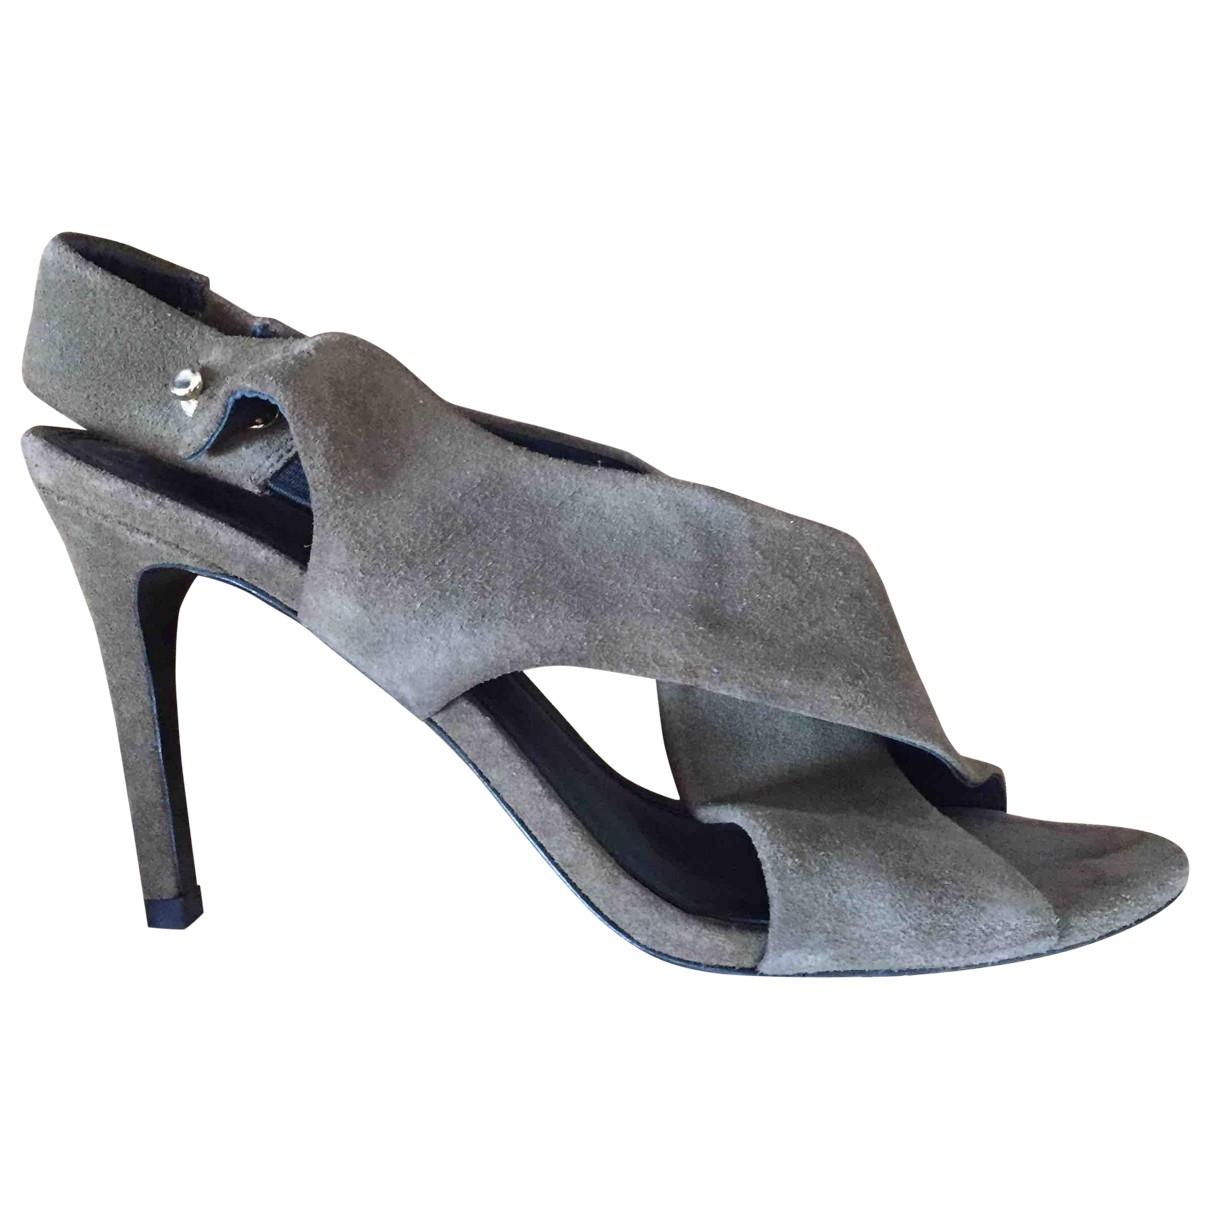 Sandro \N Beige Suede Sandals for Women 37 EU